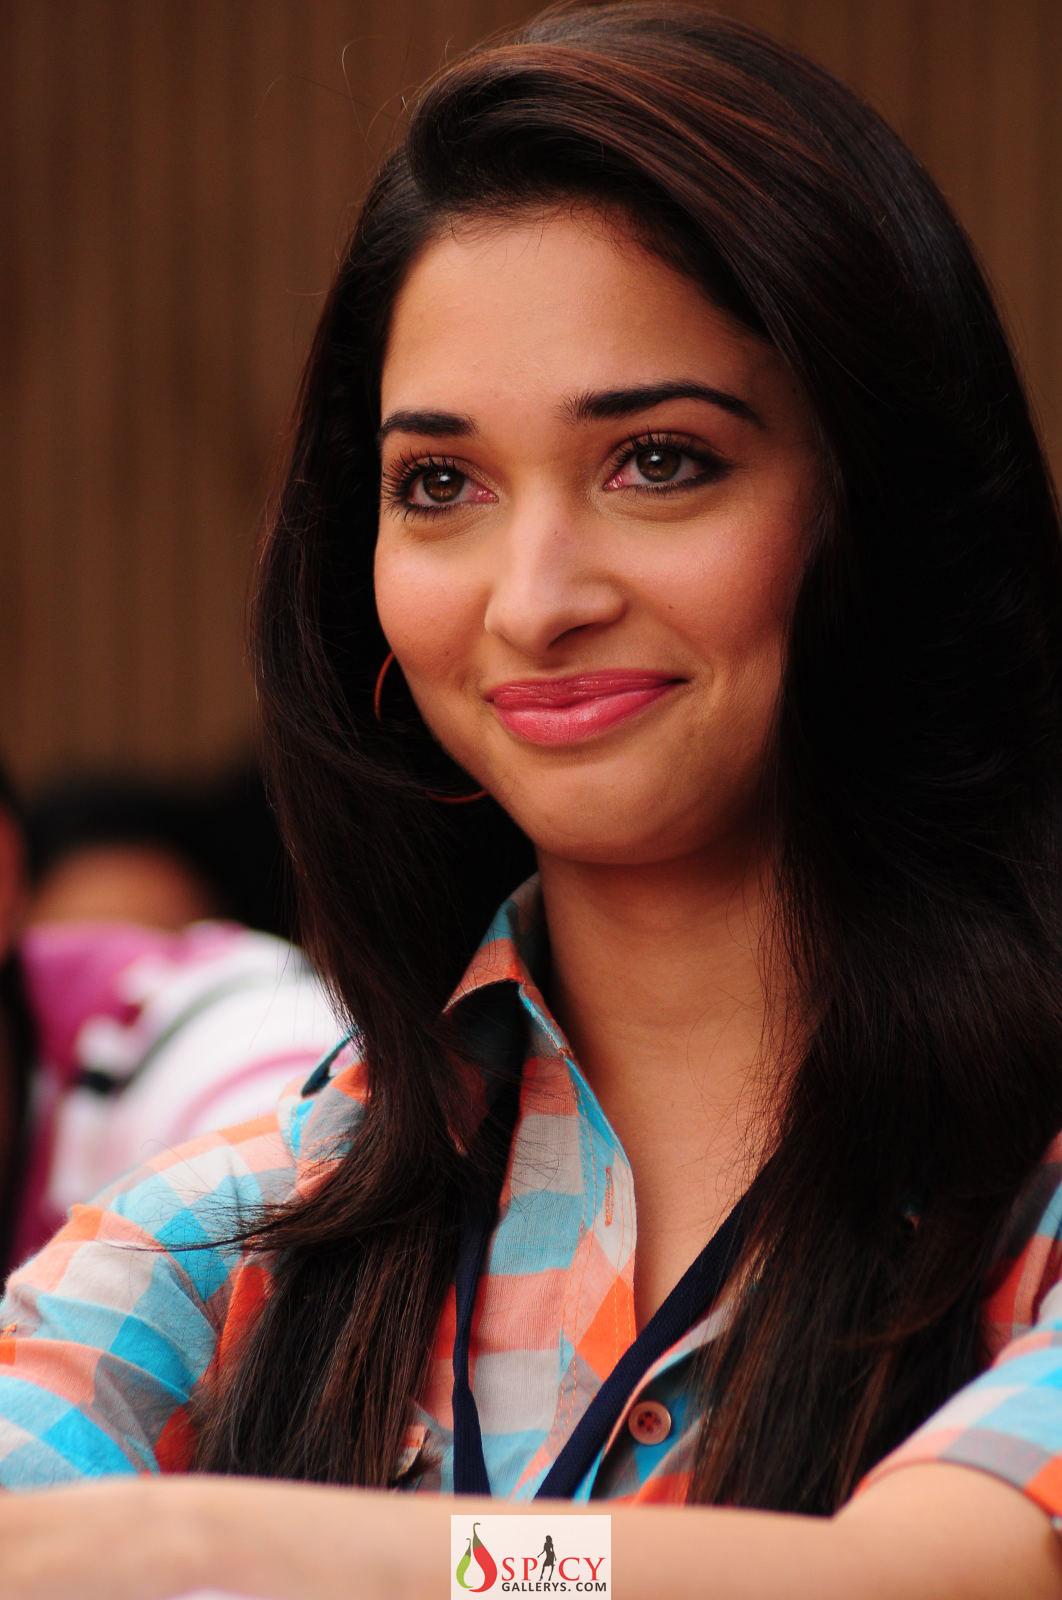 Latest Tamanna In Saree: Tamanna New Spicy Photos, In 100% Love Percent Movie